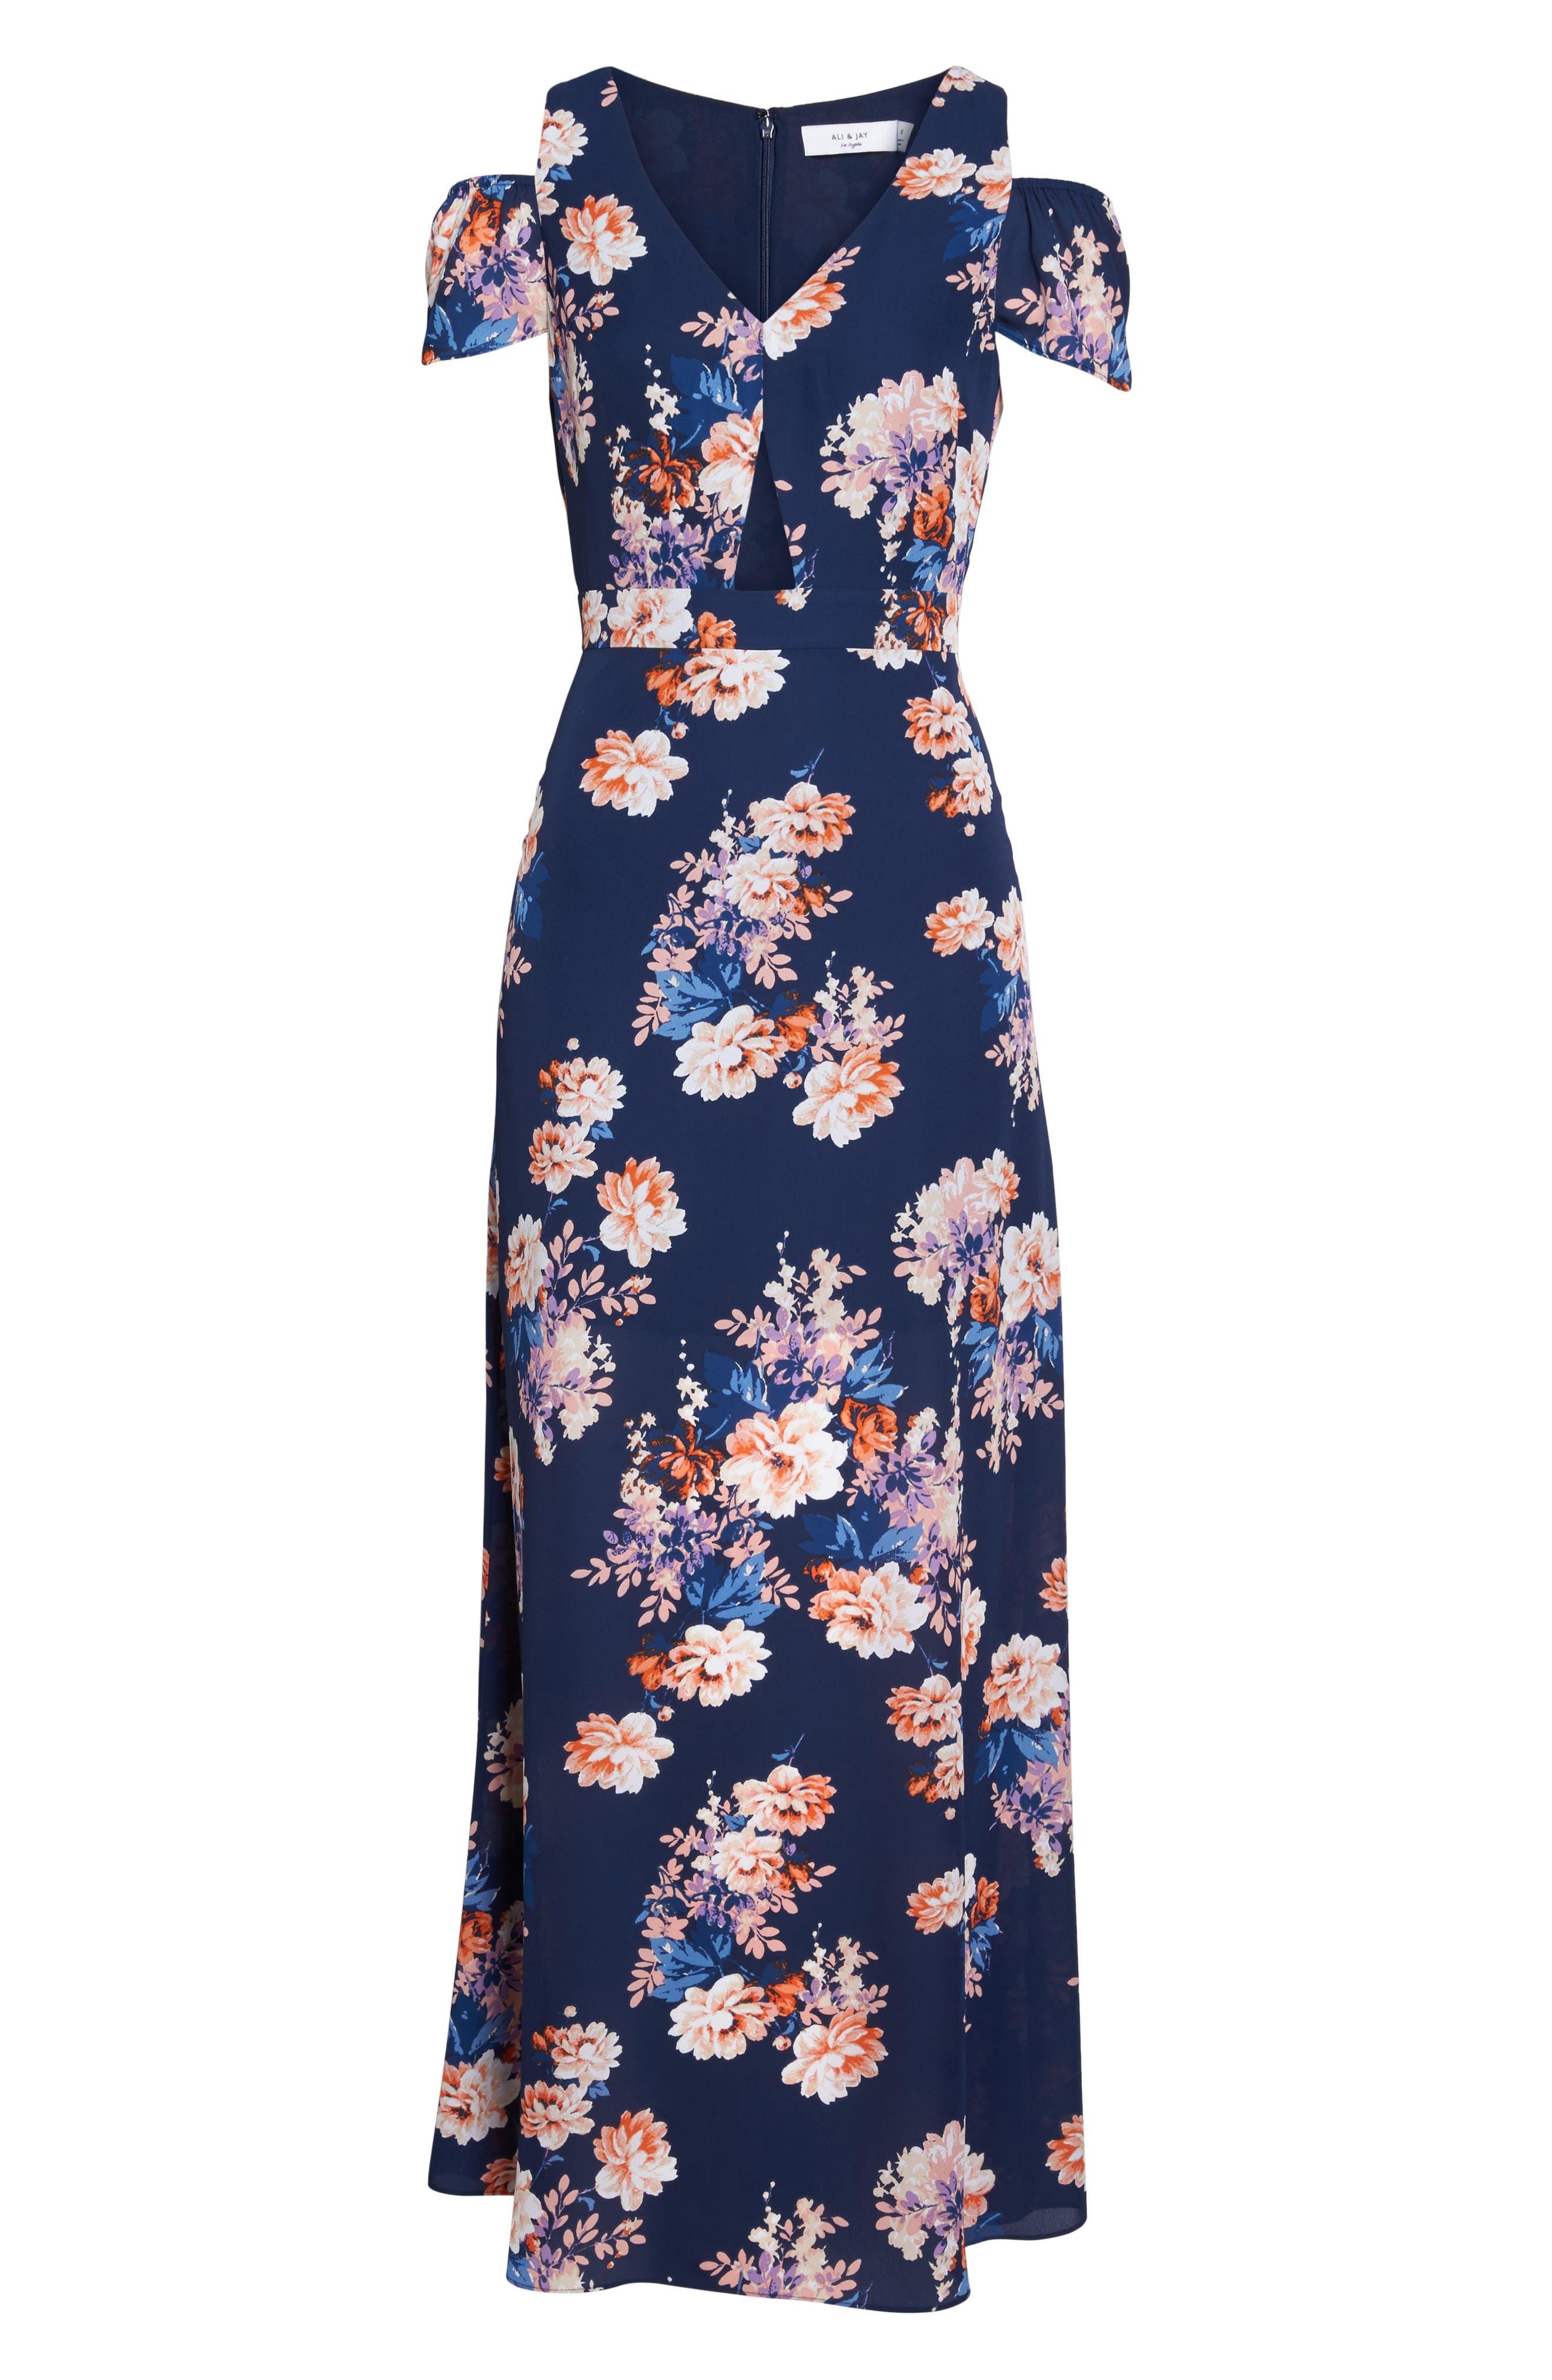 Chasing Butterflies Maxi Dress,                             Alternate thumbnail 6, color,